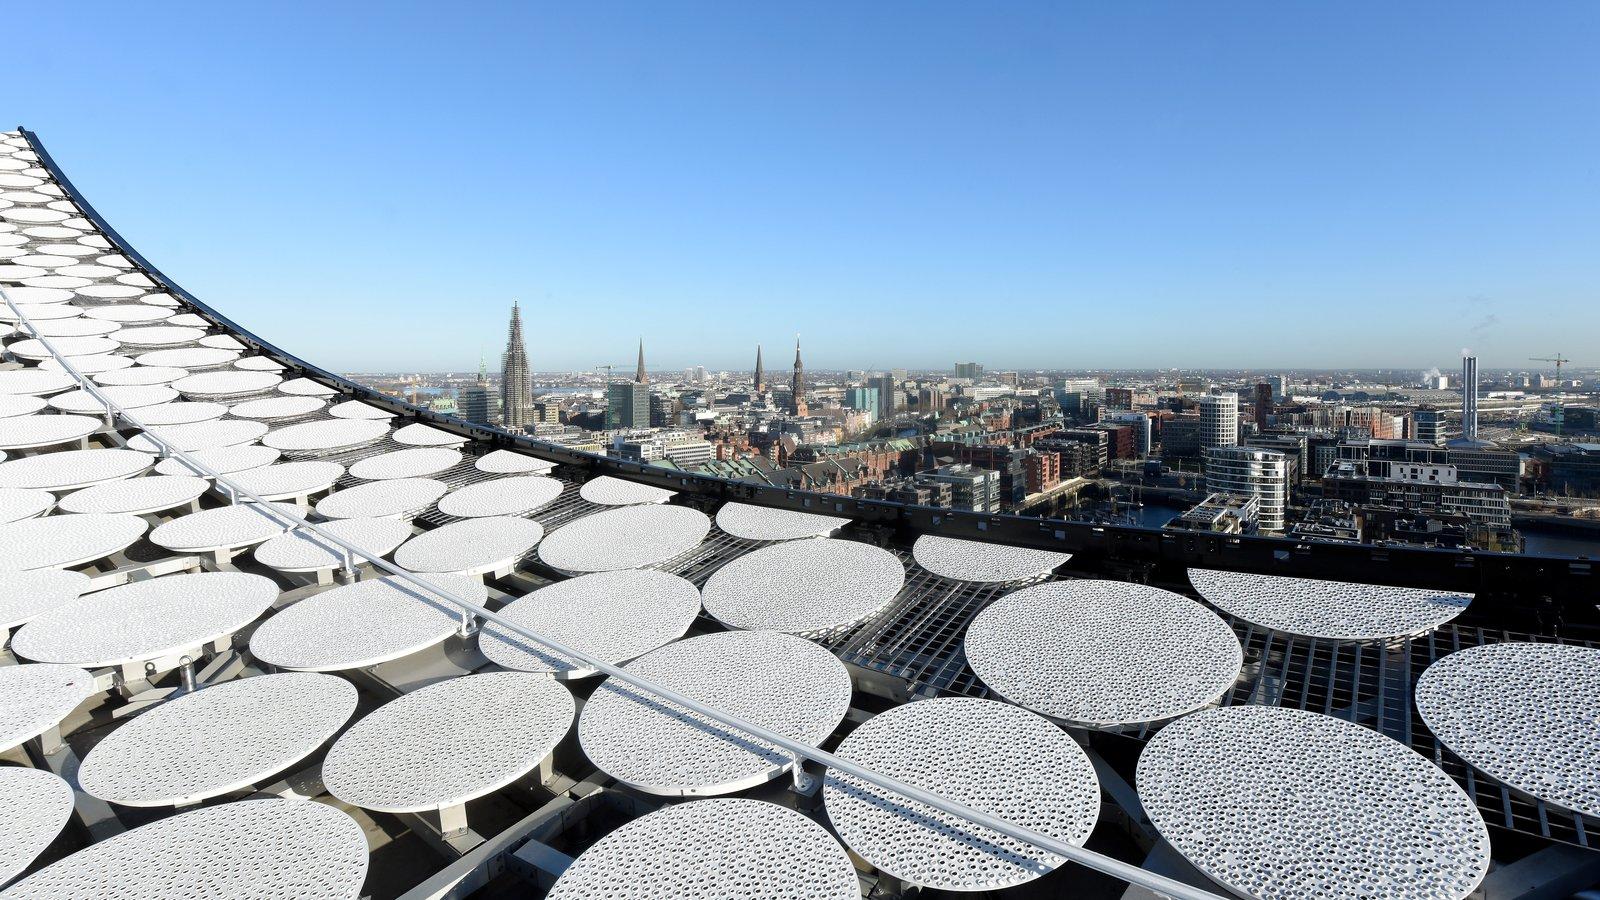 Dach Elbphilharmonie